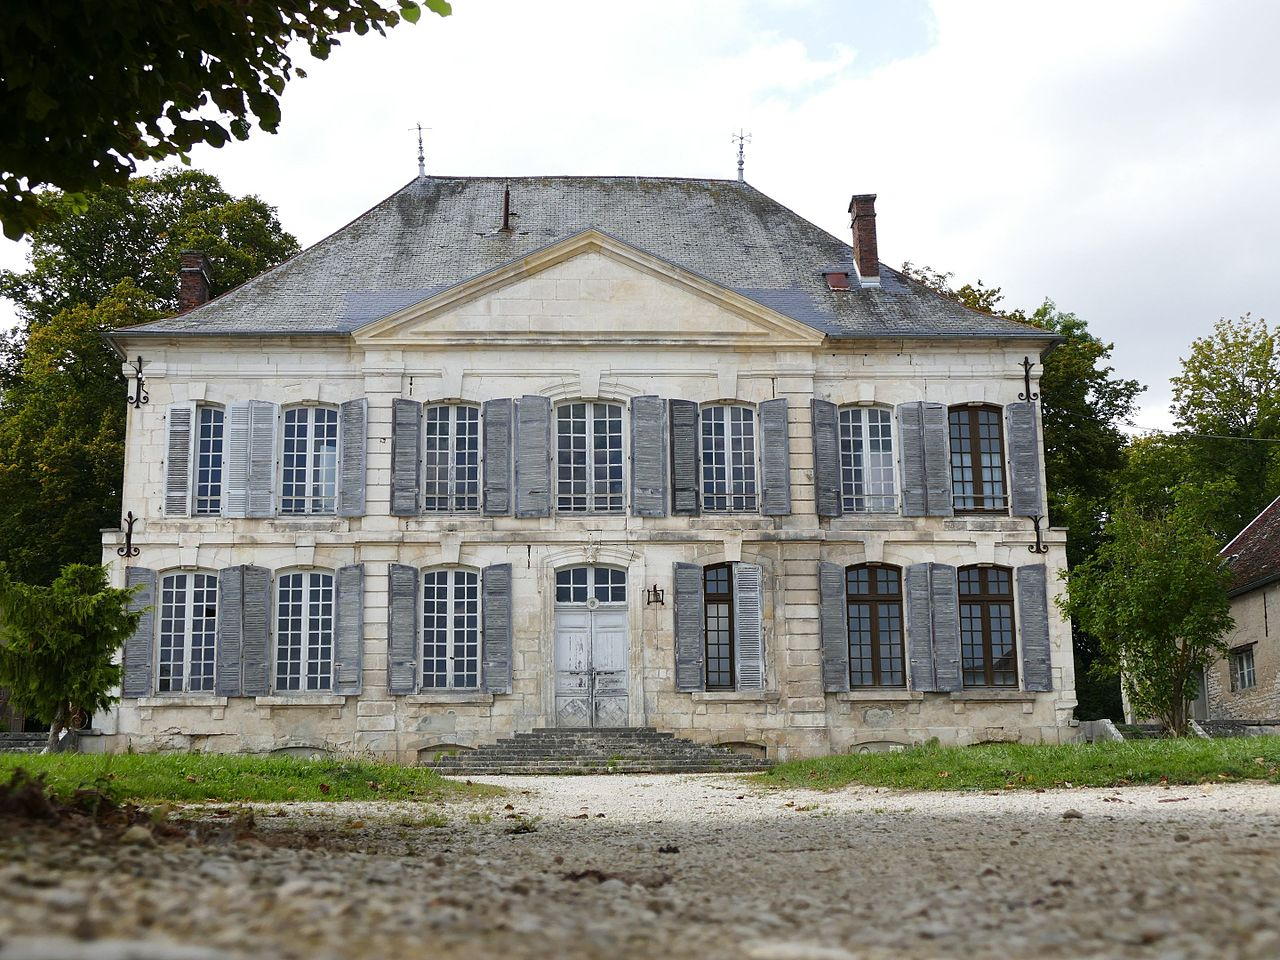 Les Riceys - Château du clos Saint-Roch - 2.jpg